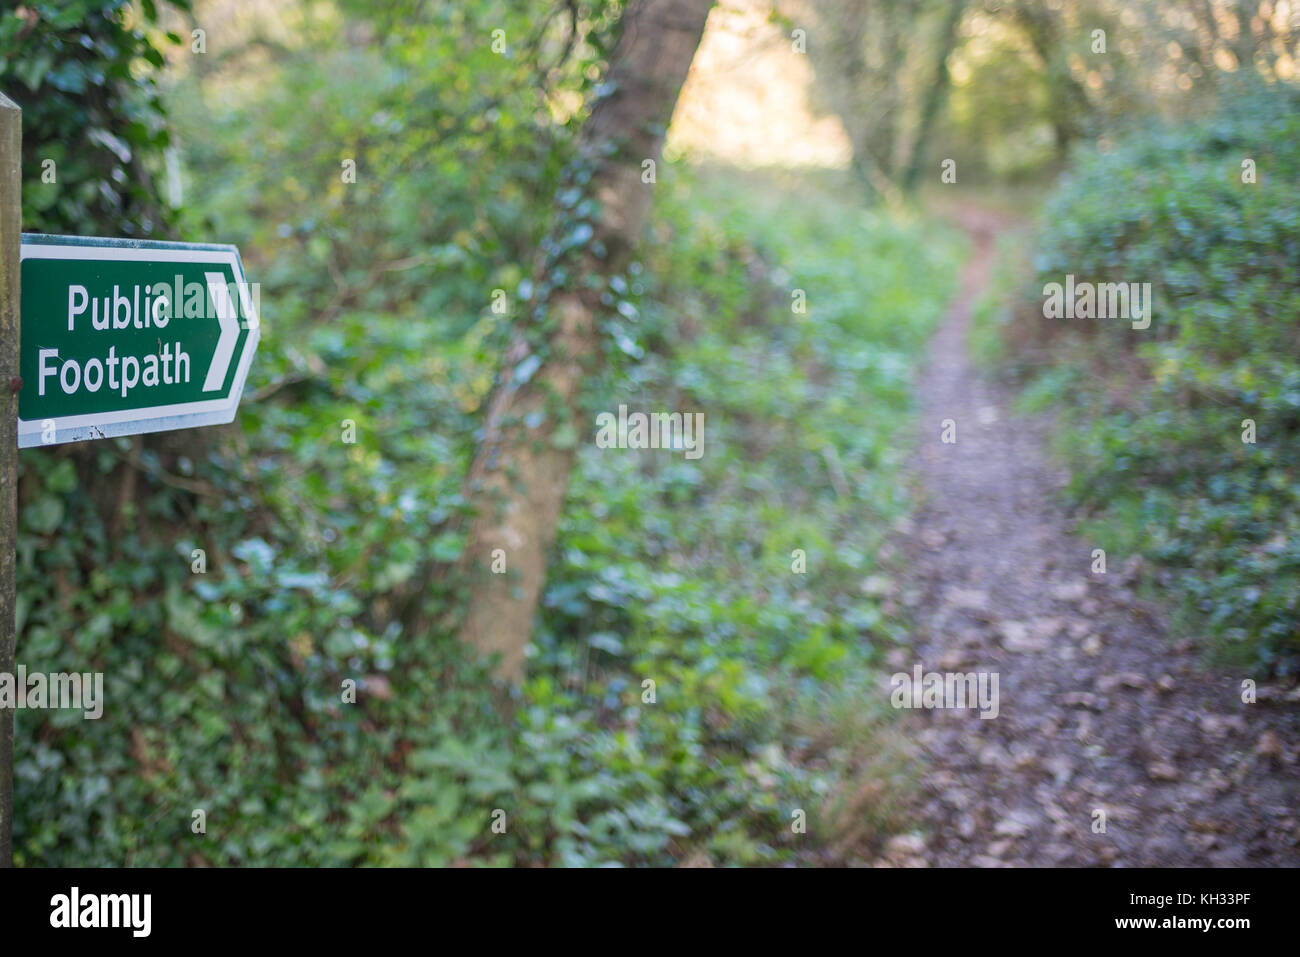 Public footpath sign in Devon woodland - Stock Image